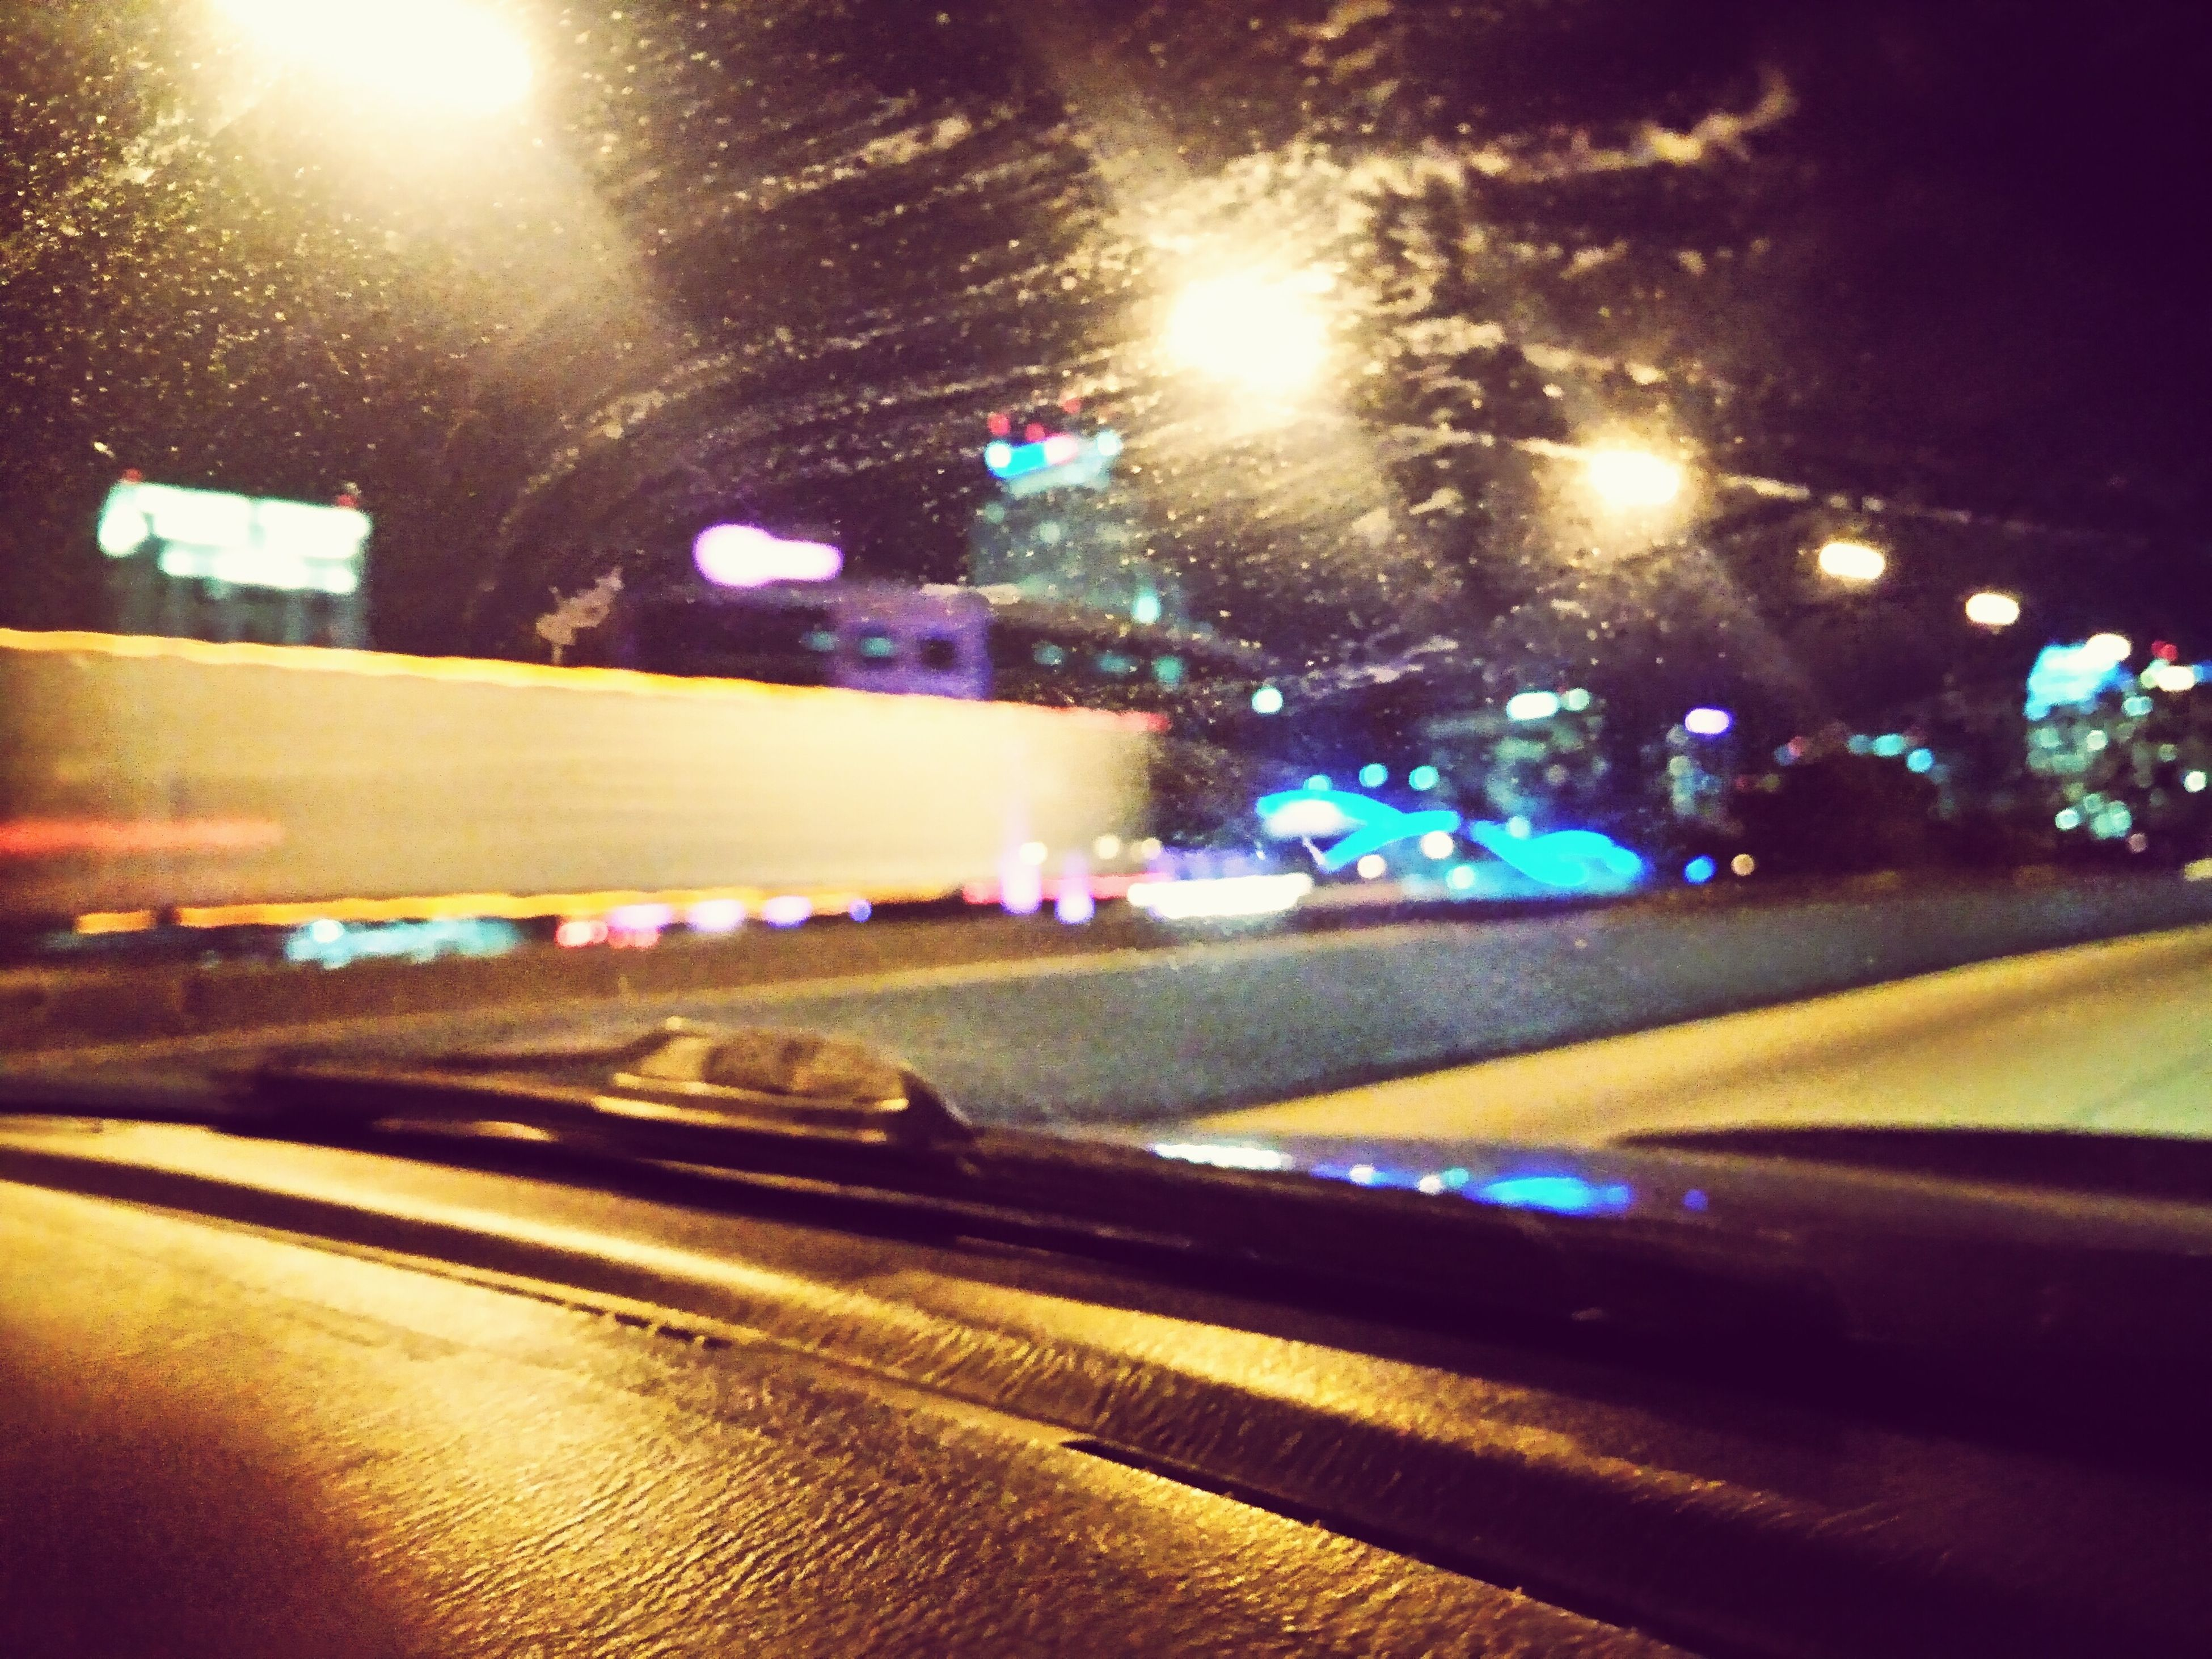 illuminated, night, transportation, city, car, land vehicle, lighting equipment, street light, road, street, mode of transport, traffic, light - natural phenomenon, city street, light trail, city life, building exterior, motion, long exposure, architecture